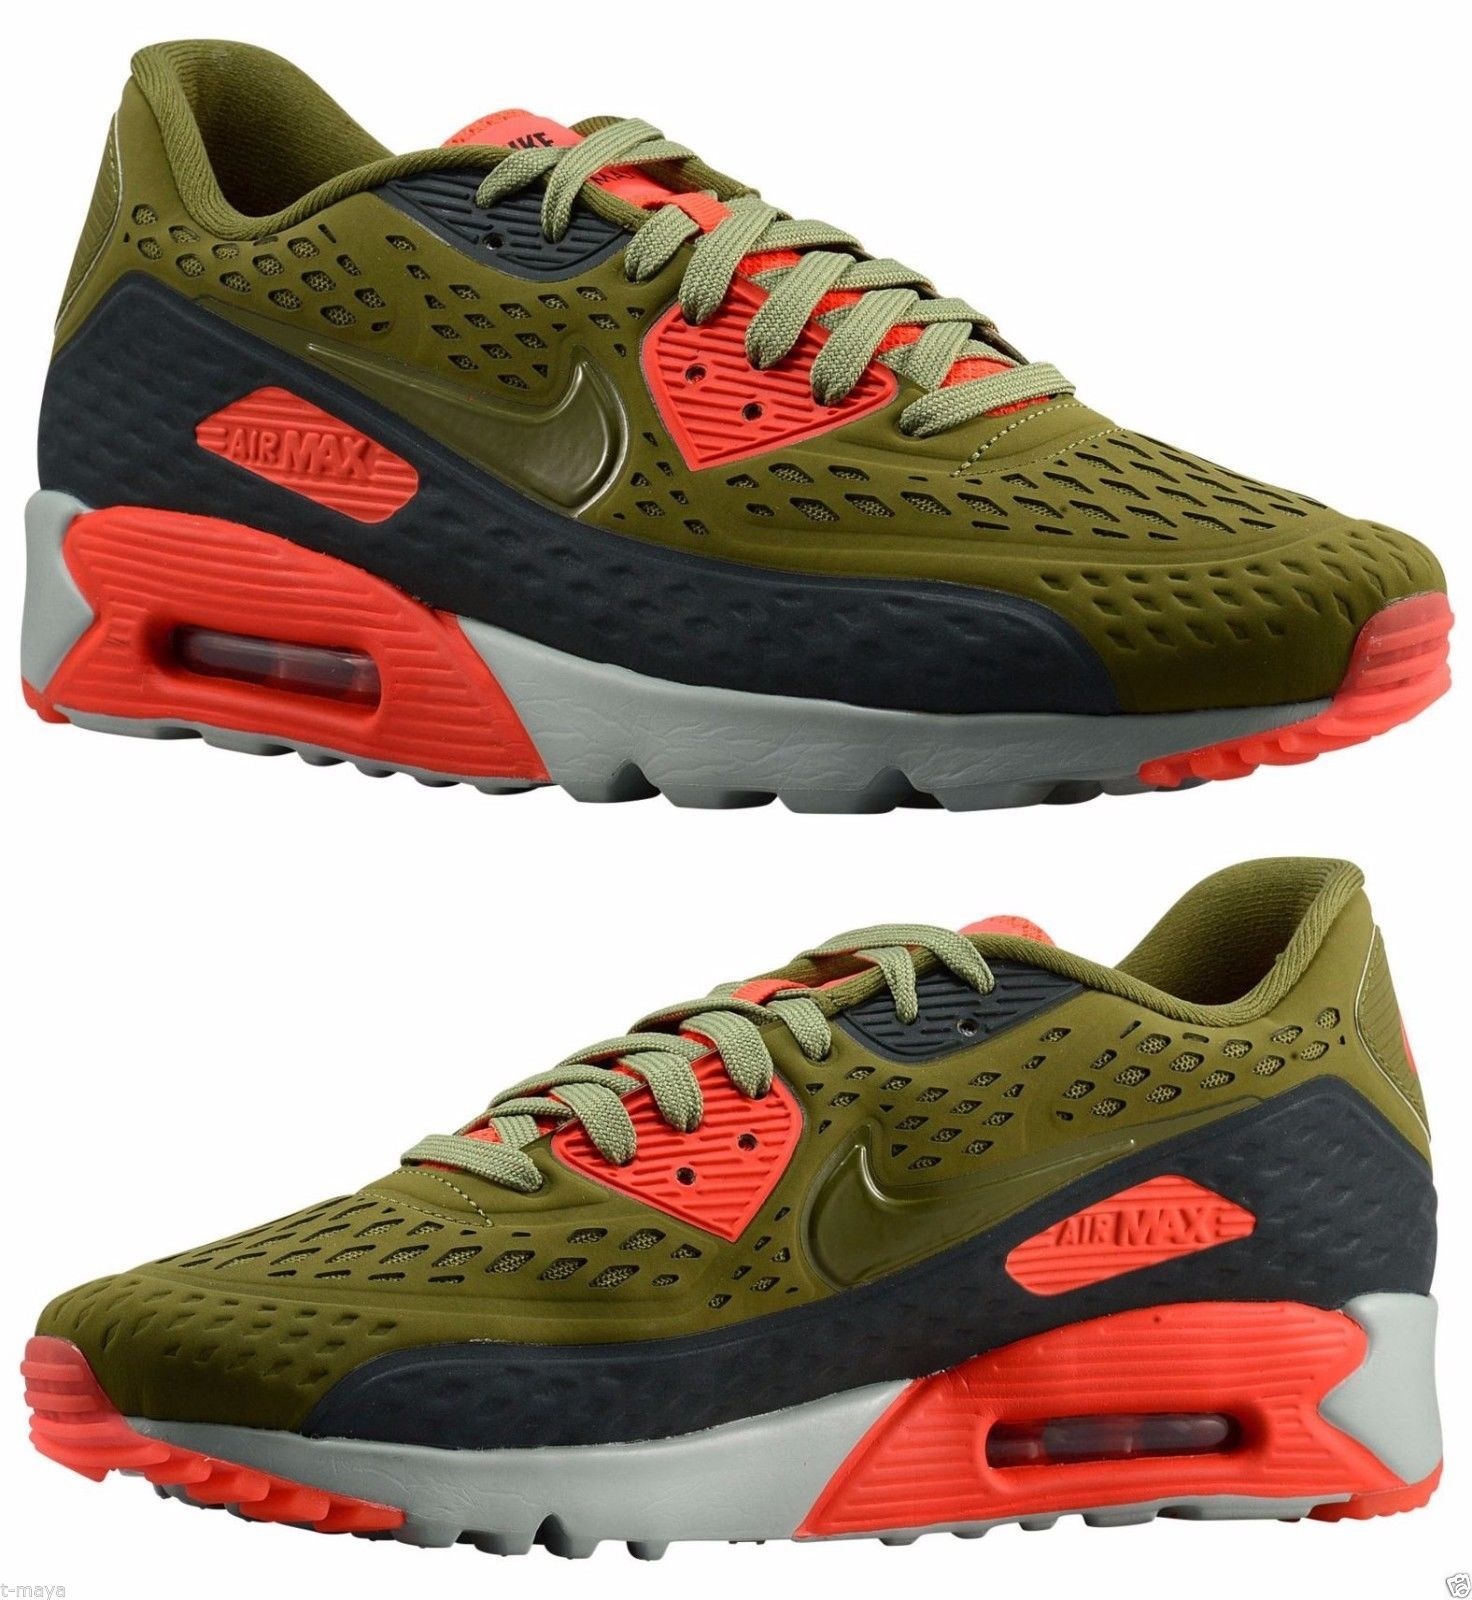 nike shox pour les filles - Nike air max 90 premium ale brown midnight navy 700155 201   Nike ...